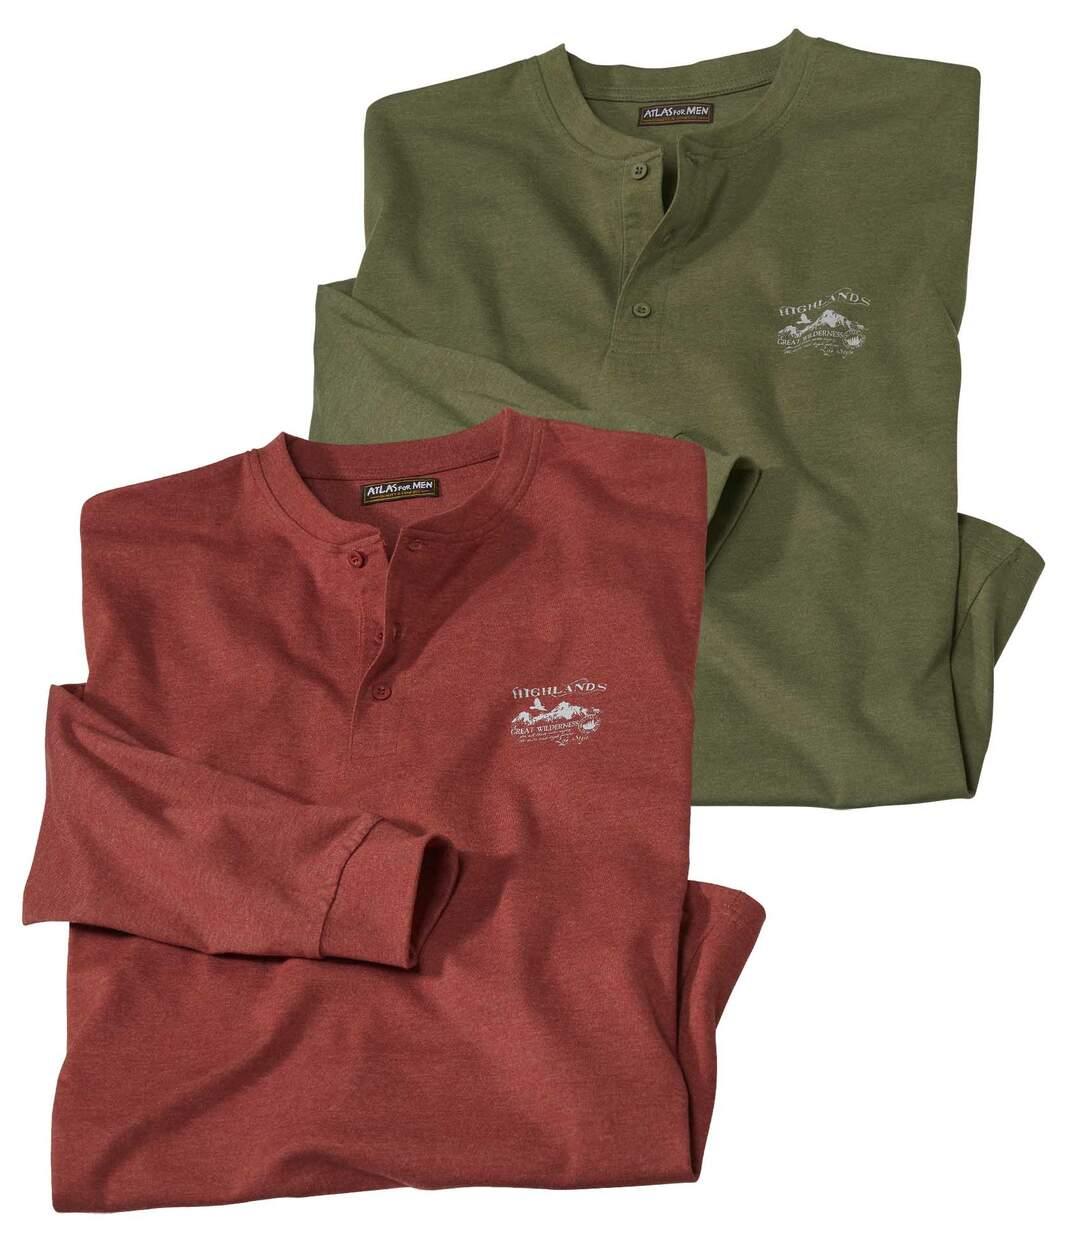 Pack of 2 Men's CasualButton-Neck Tops - Khaki Rust